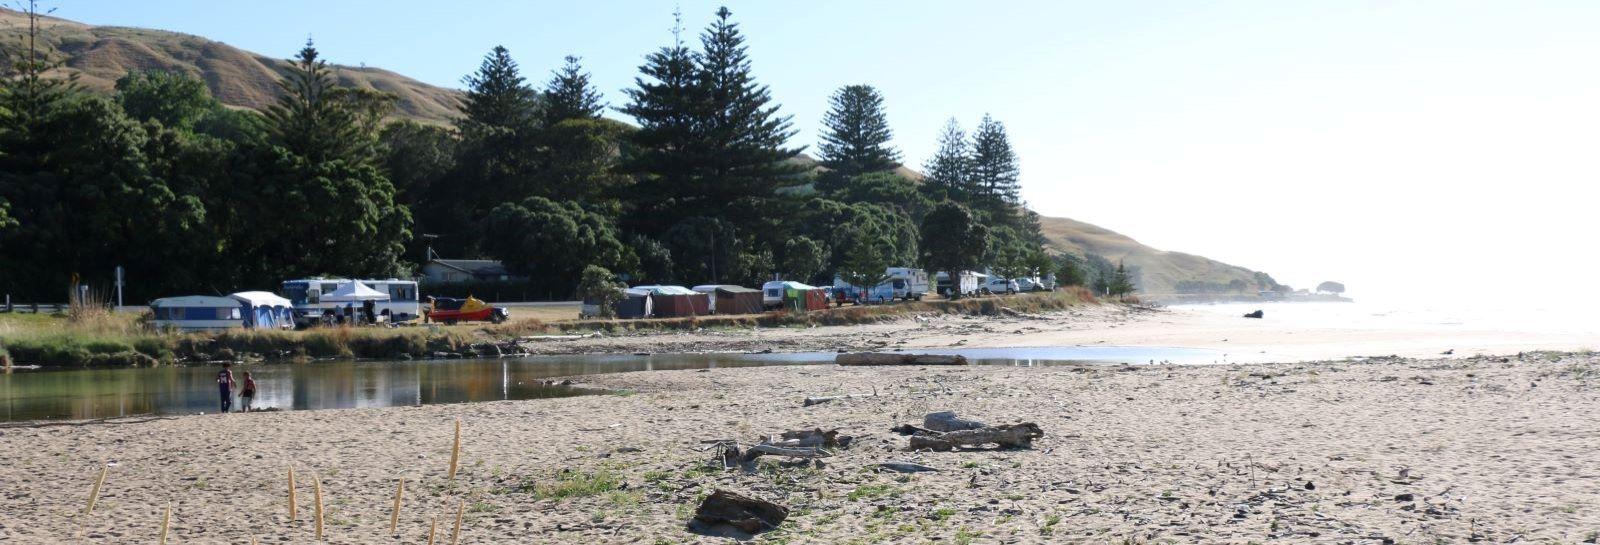 Camping banner image